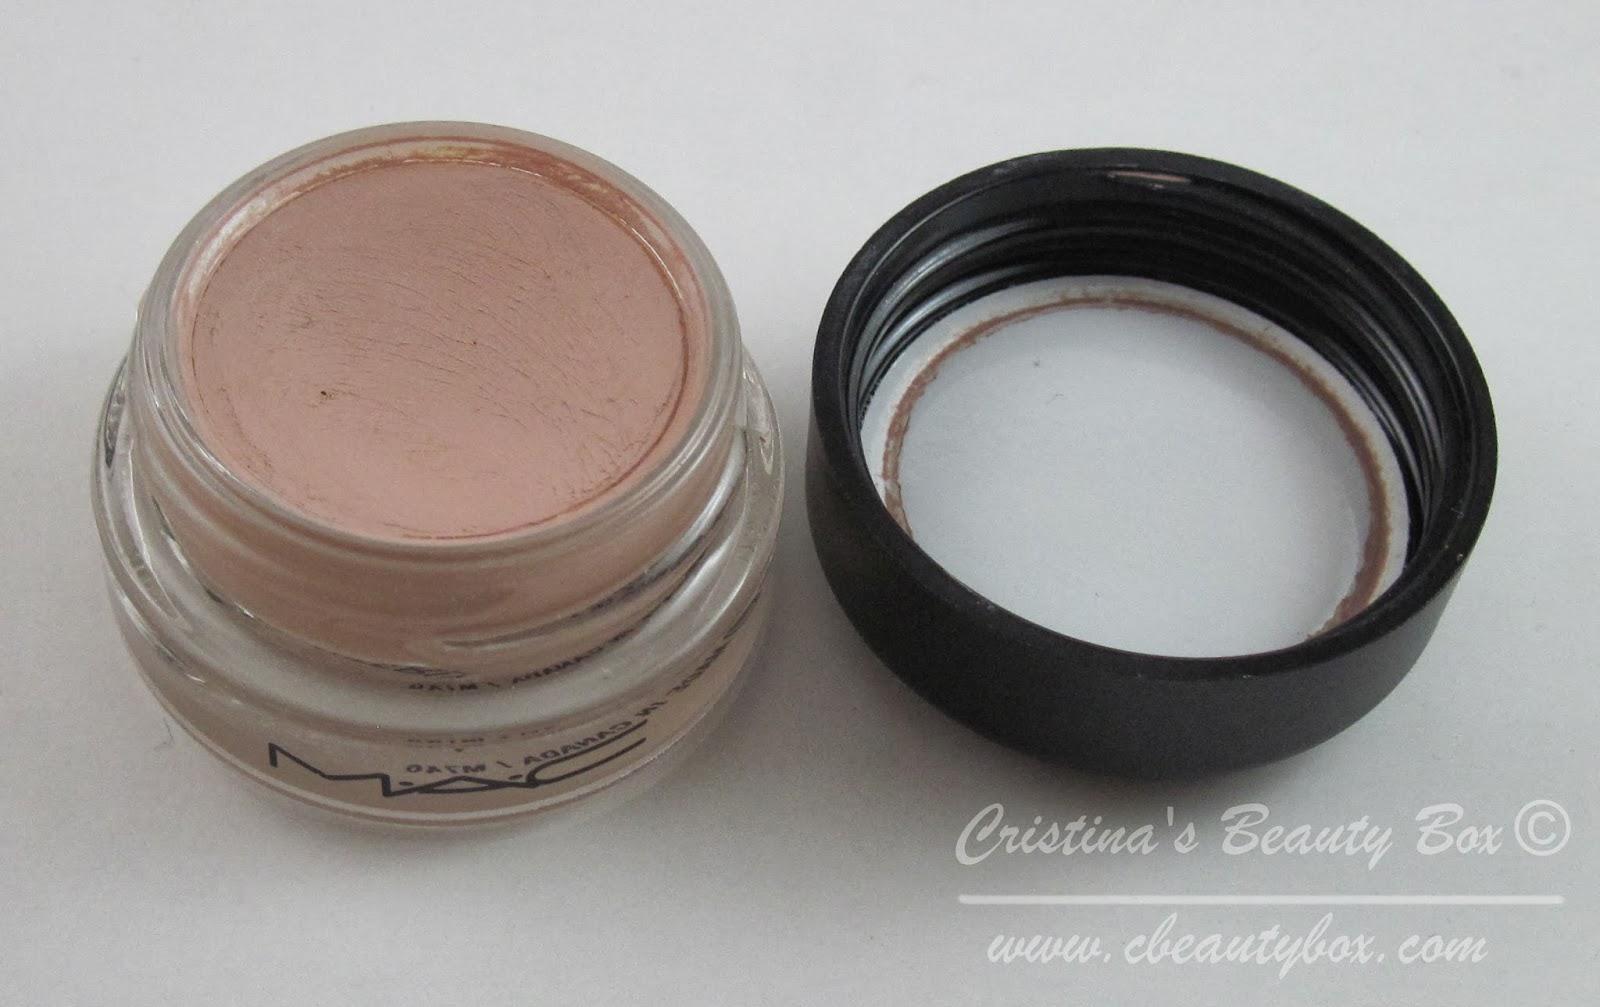 mac paint pot painterly the best primer for eyelids cristina